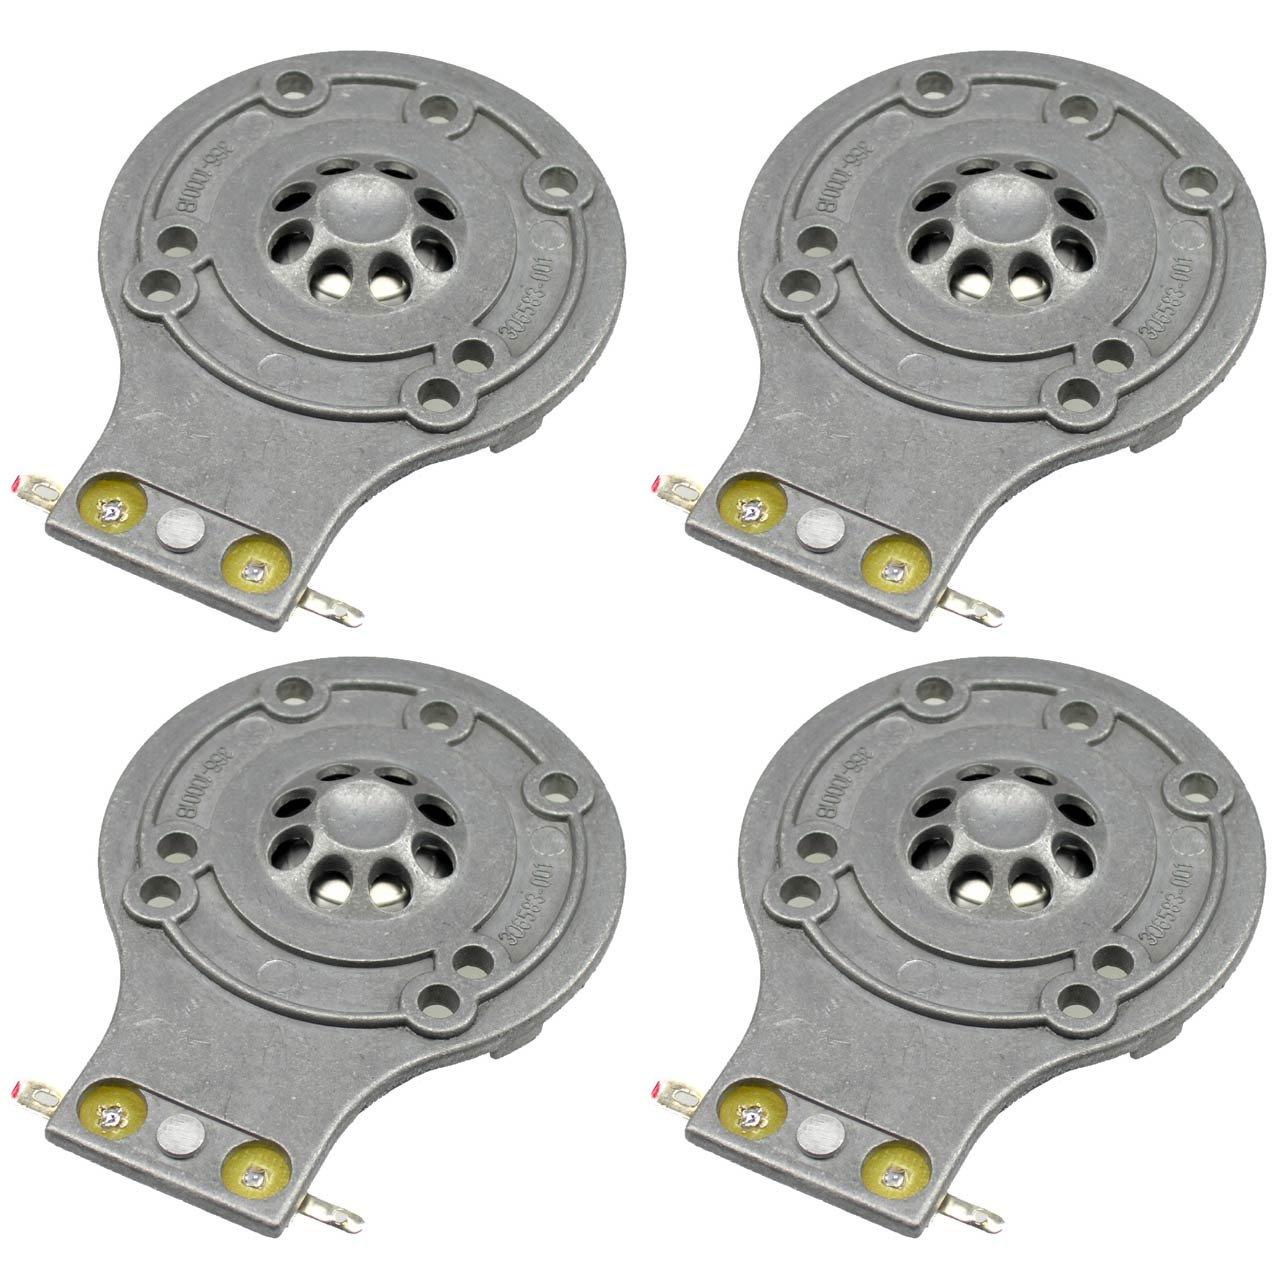 JBL Diaphragm 4 Pack for 2412H, 2412H-1, Soundfactor, MPro, MP215, MP225, EON15, EON10, JRX100, JRX112, JRX115 TR125, TR126, TR225, D-2412-4